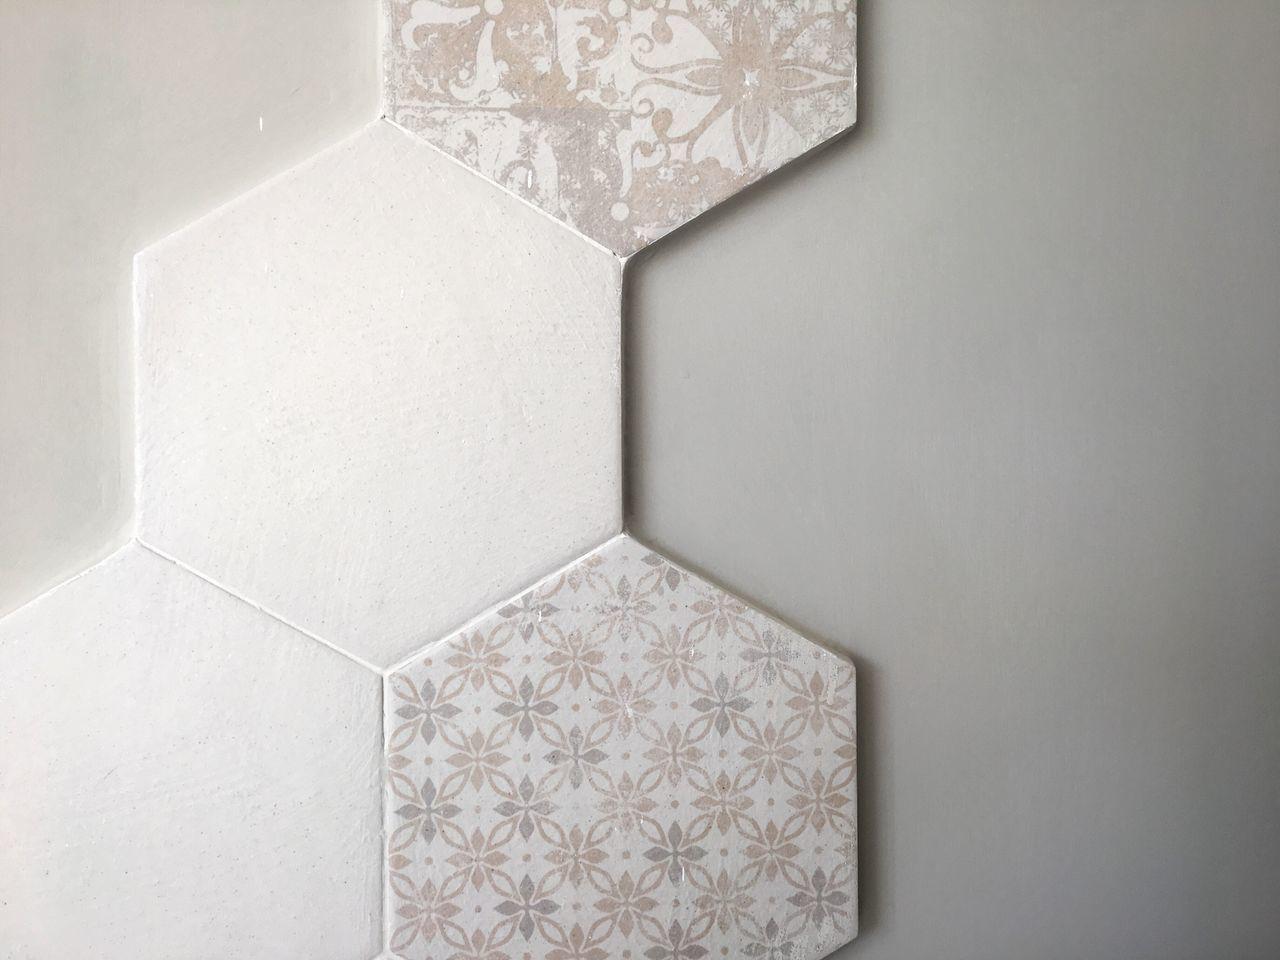 Tile Bee Hive Nest Home Start Finish Work Indoors  Pattern Architecture Design Delacruzfotografia David De La Cruz No People Close-up Day